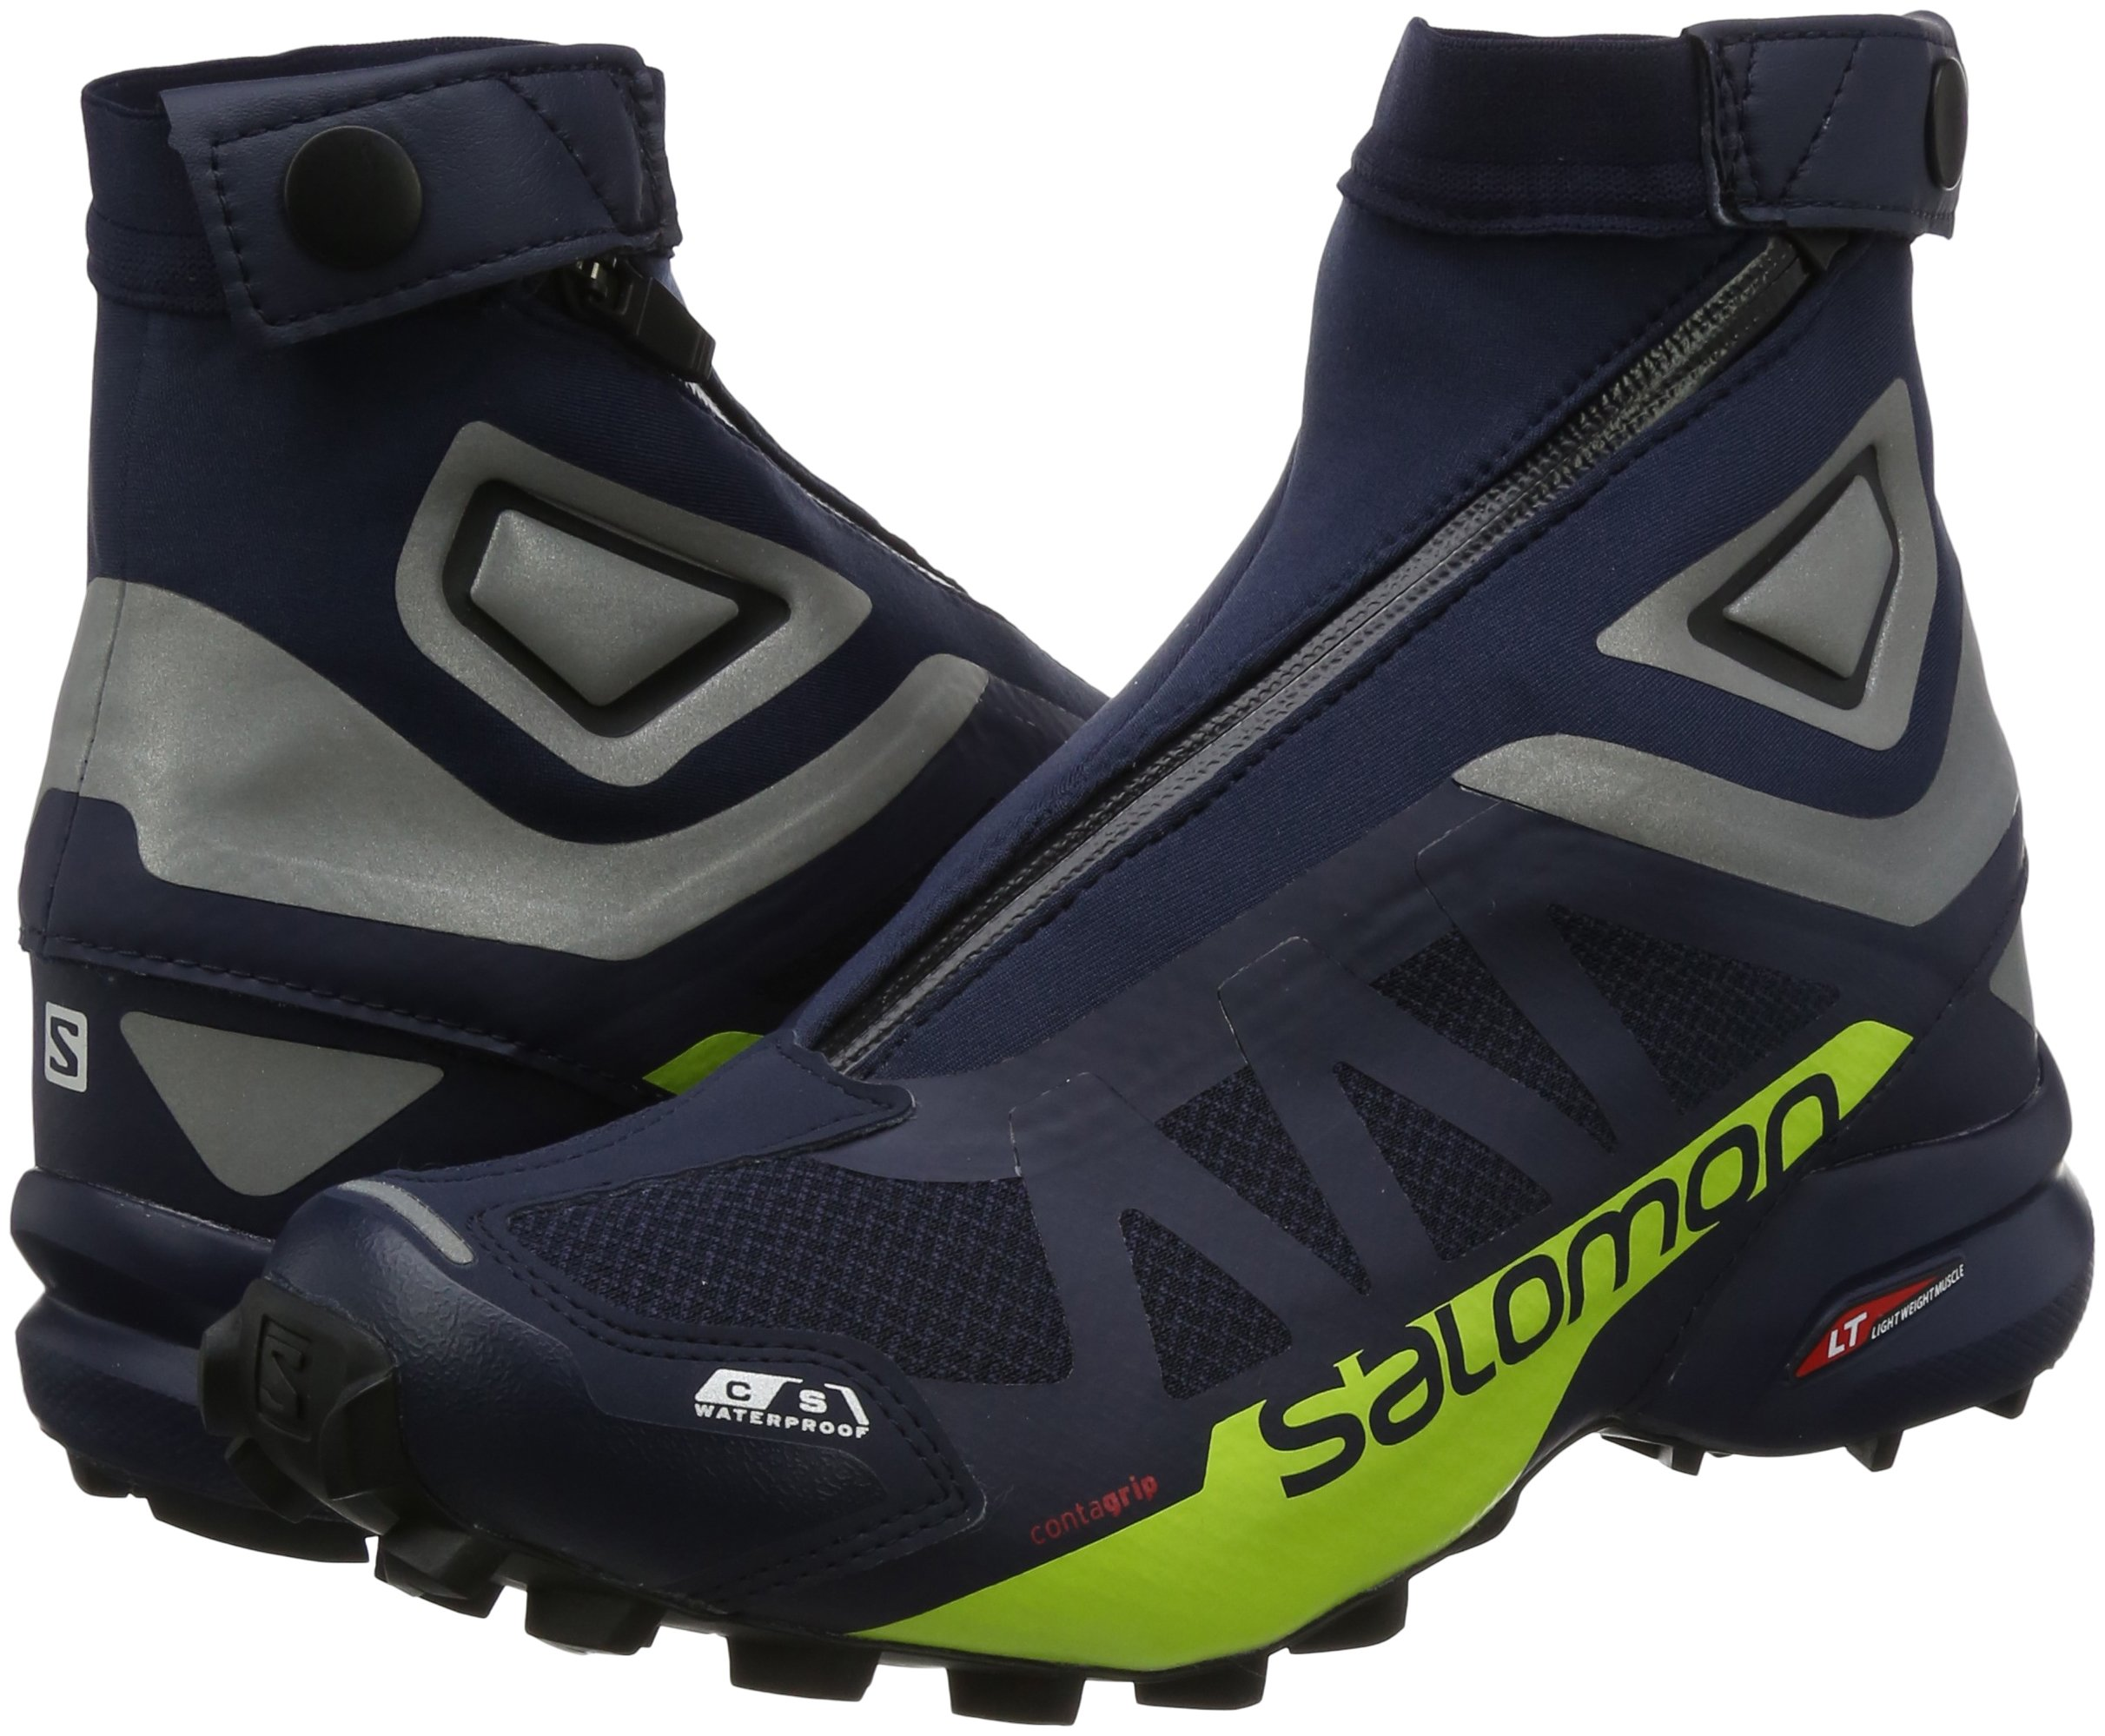 Salomon Snowcross 2 CS Waterproof Trail Running Shoe - Men's-Navy Blazer/Reflective L39451200-8.5 by Salomon (Image #5)